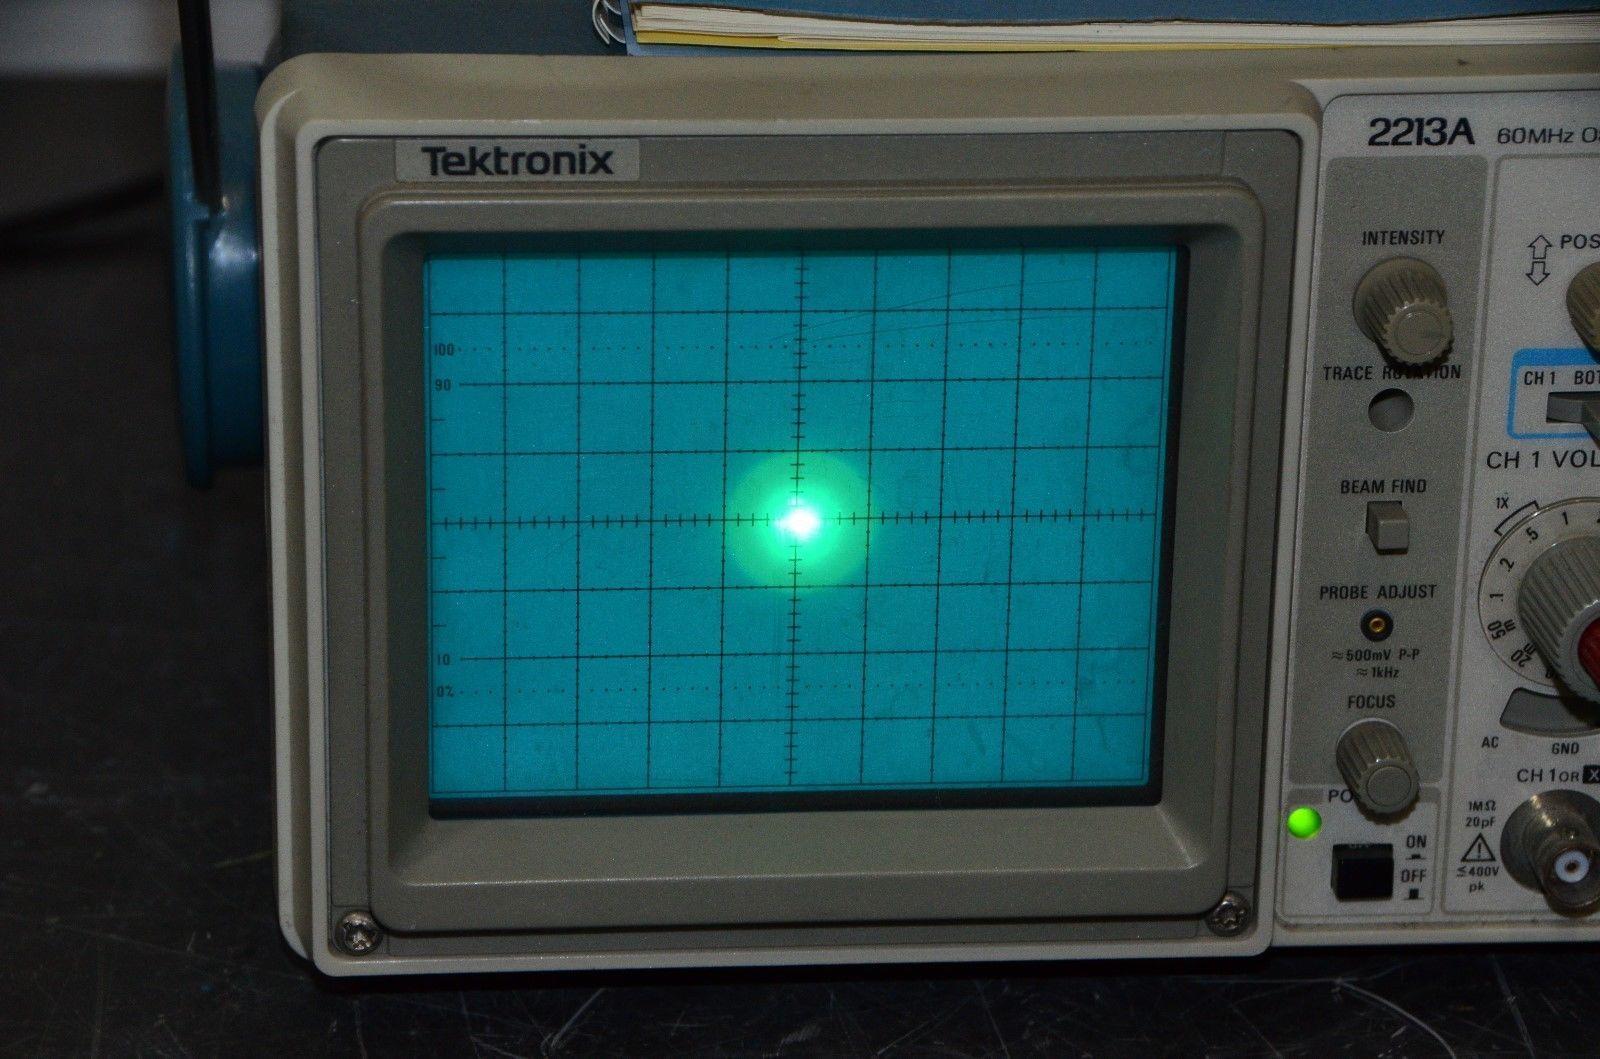 tektronix 2213a 60 mhz analog oscilloscope and 50 similar items rh bonanza com tektronix 2215 manual tektronix 2215 service manual download